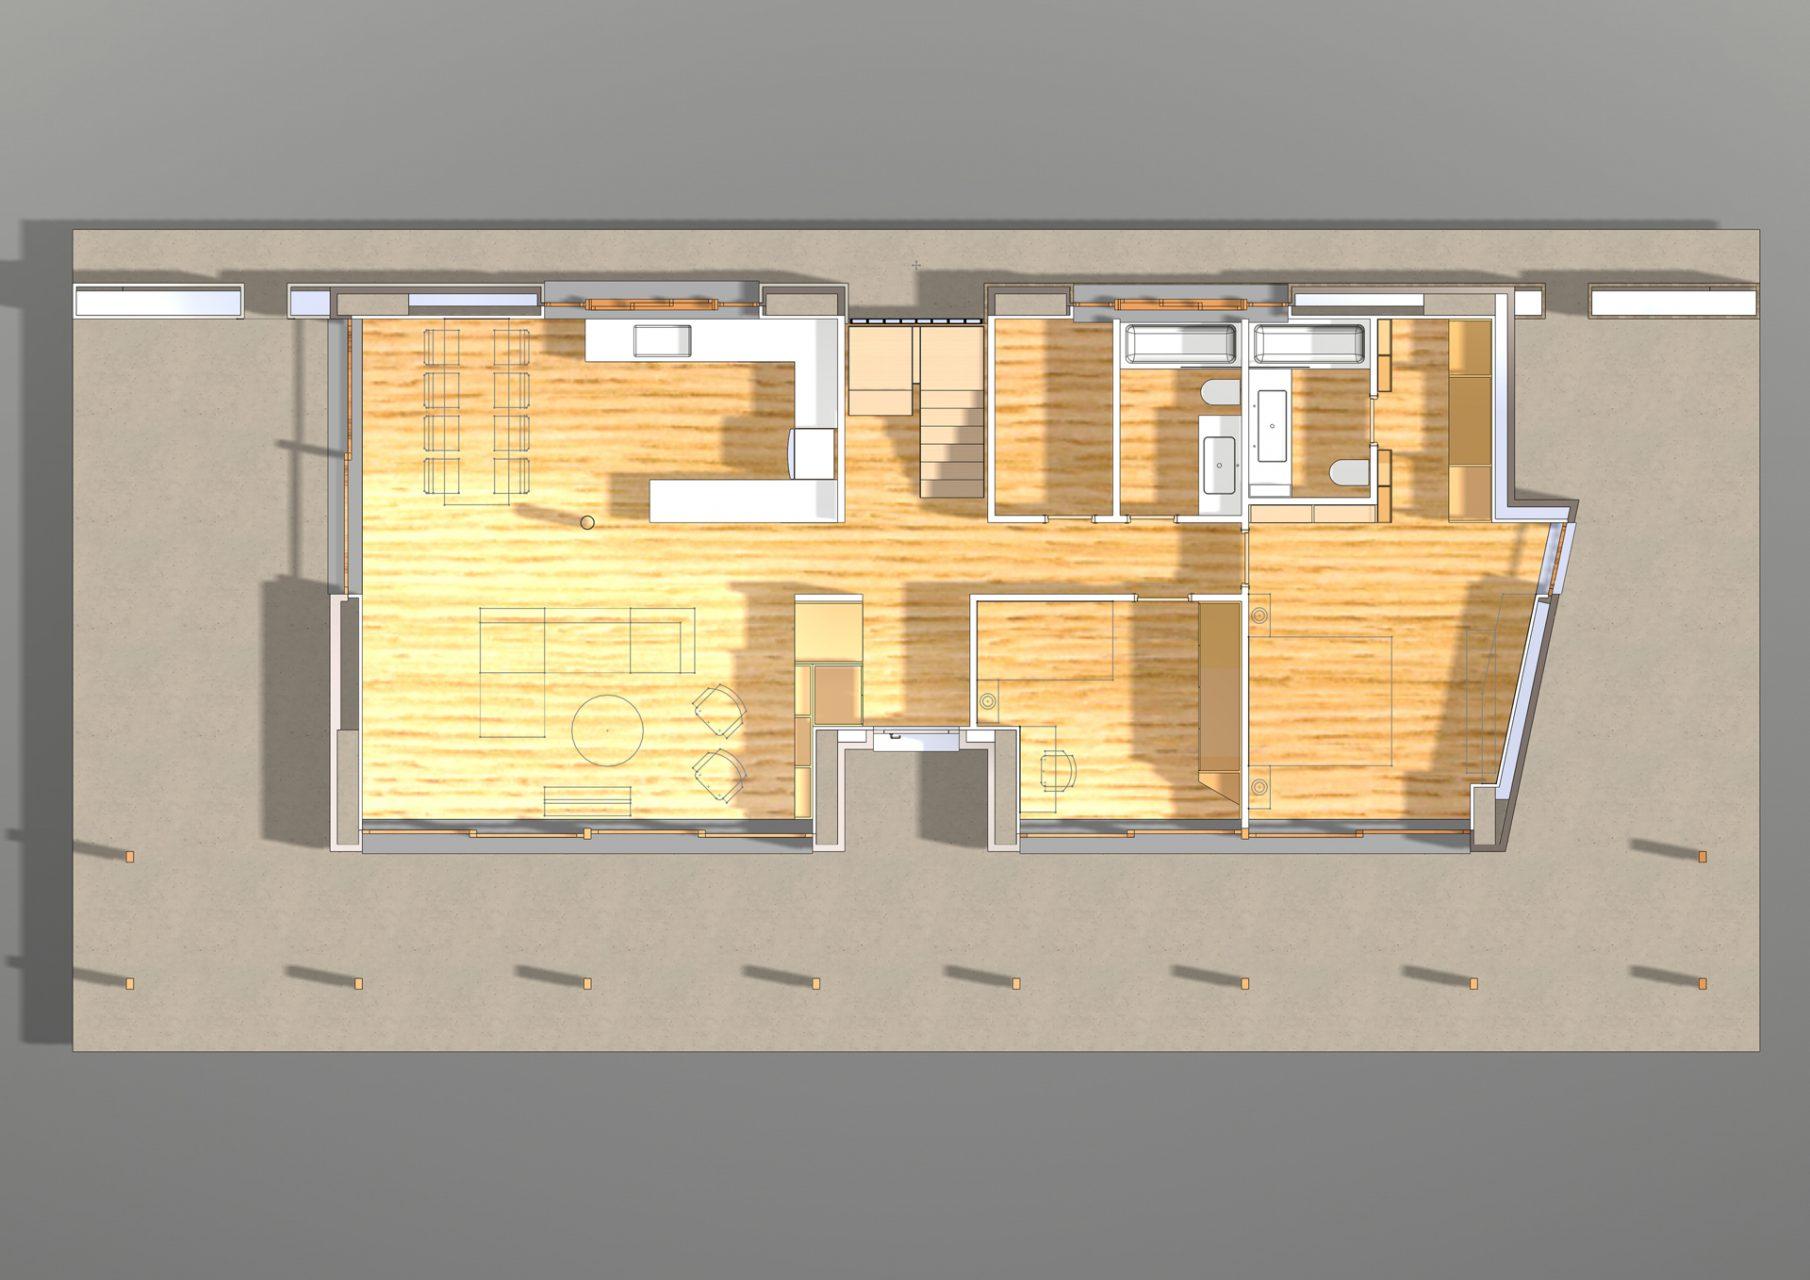 KL HOUSE 01 - plan F